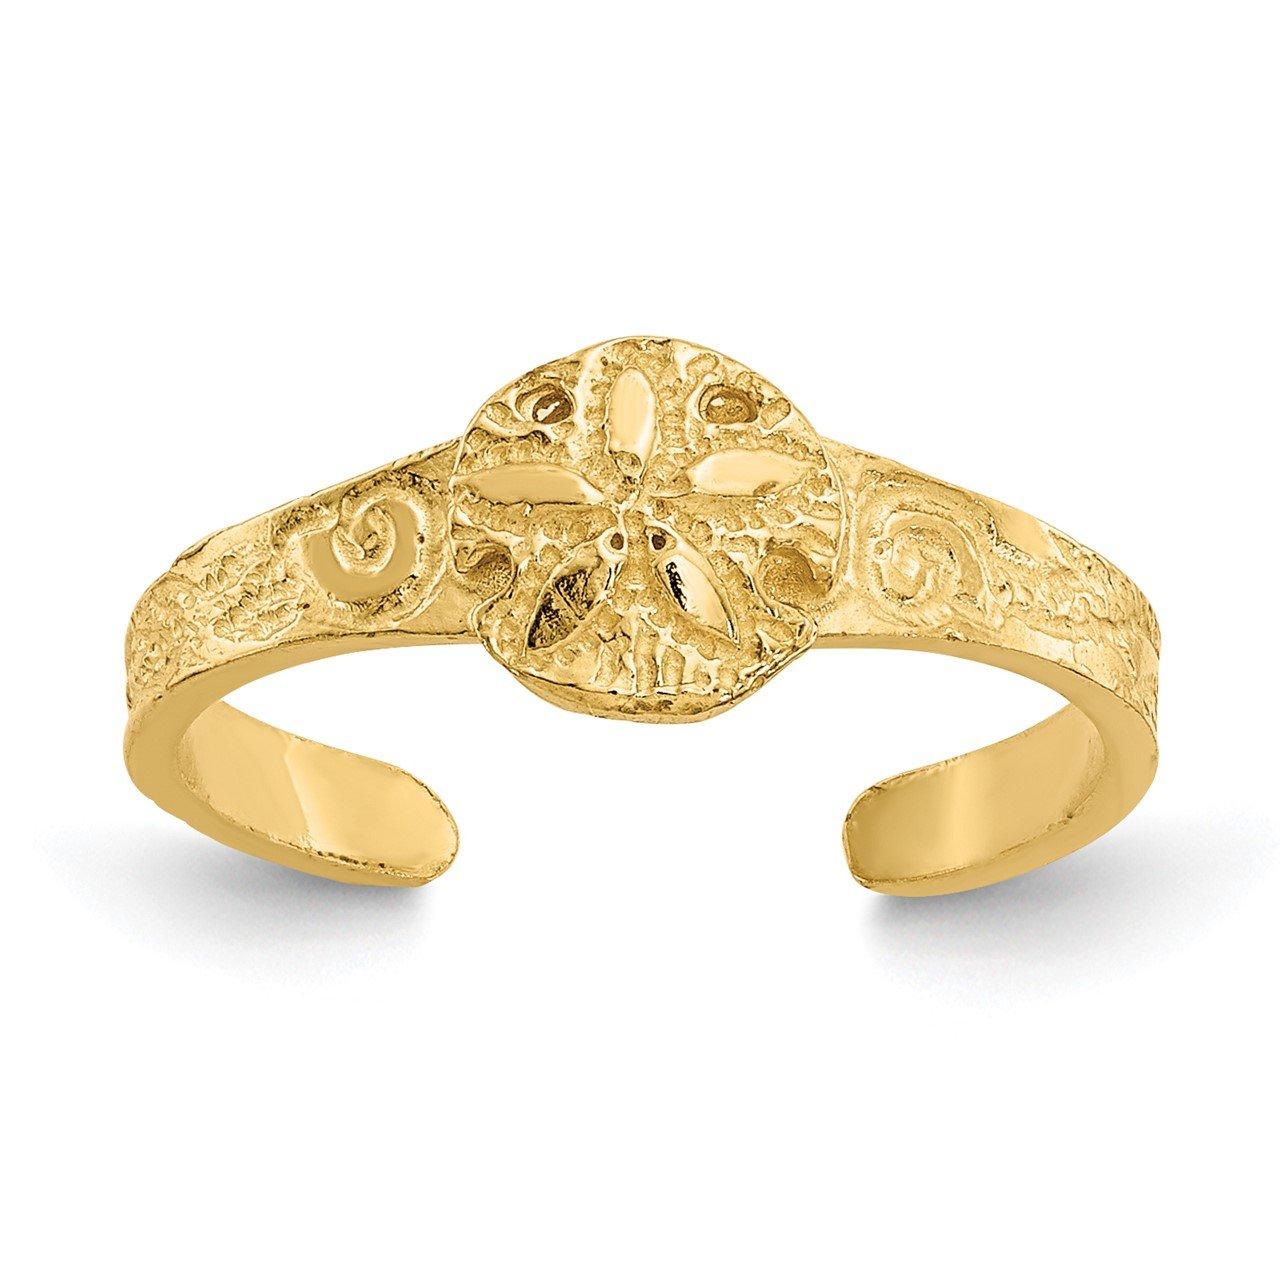 14K Diamond-cut Sand Dollar Toe Ring